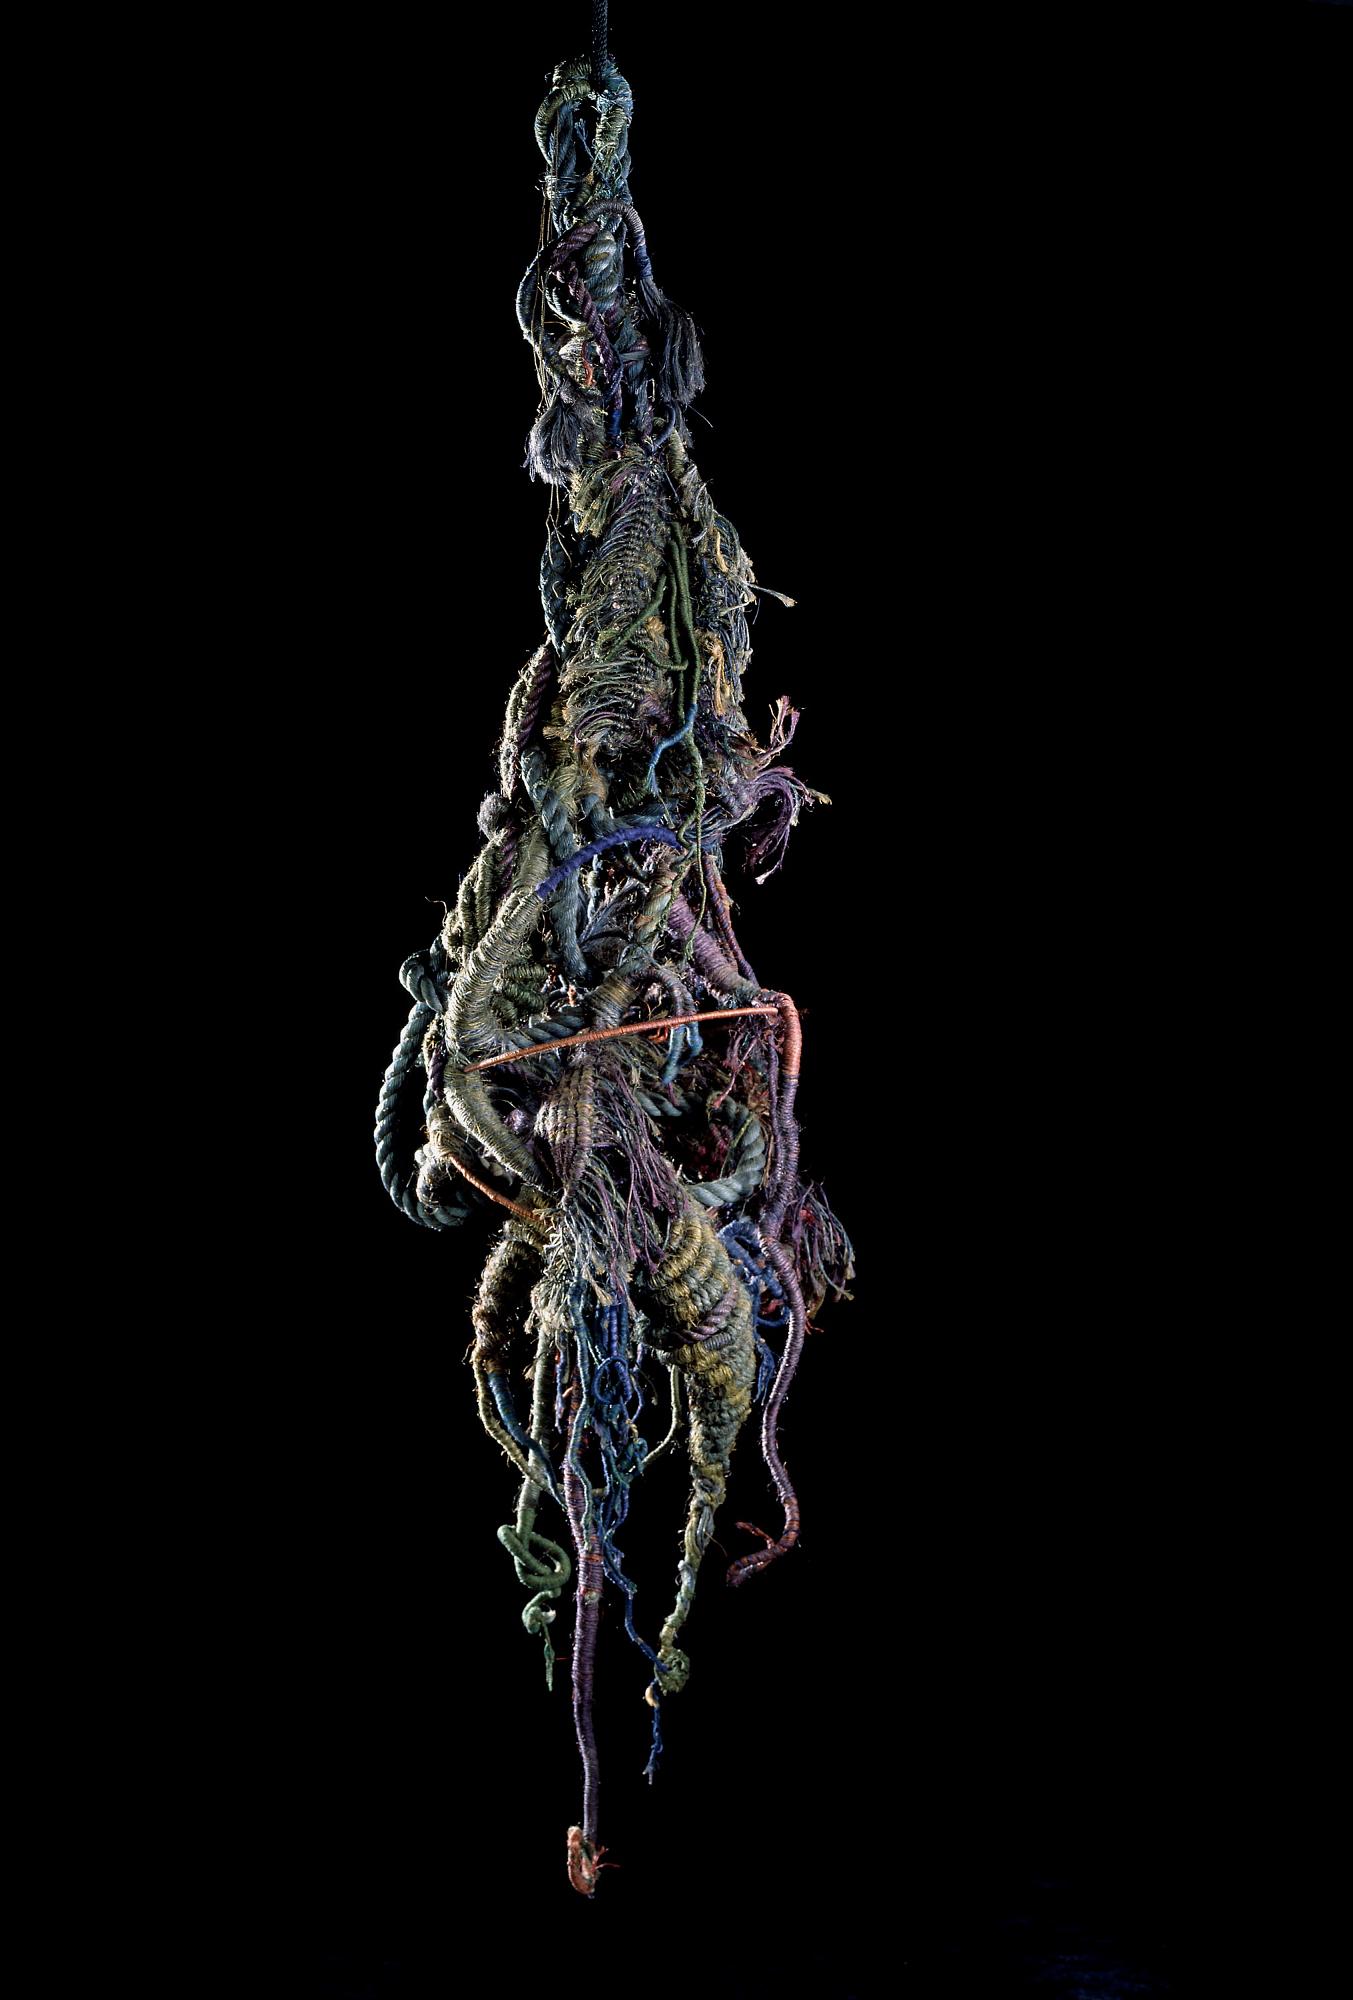 Neda Alhilali, Medusa, 1975, mixed fibers, Smithsonian American Art Museum, Gift of Phyllis Mael, 2002.